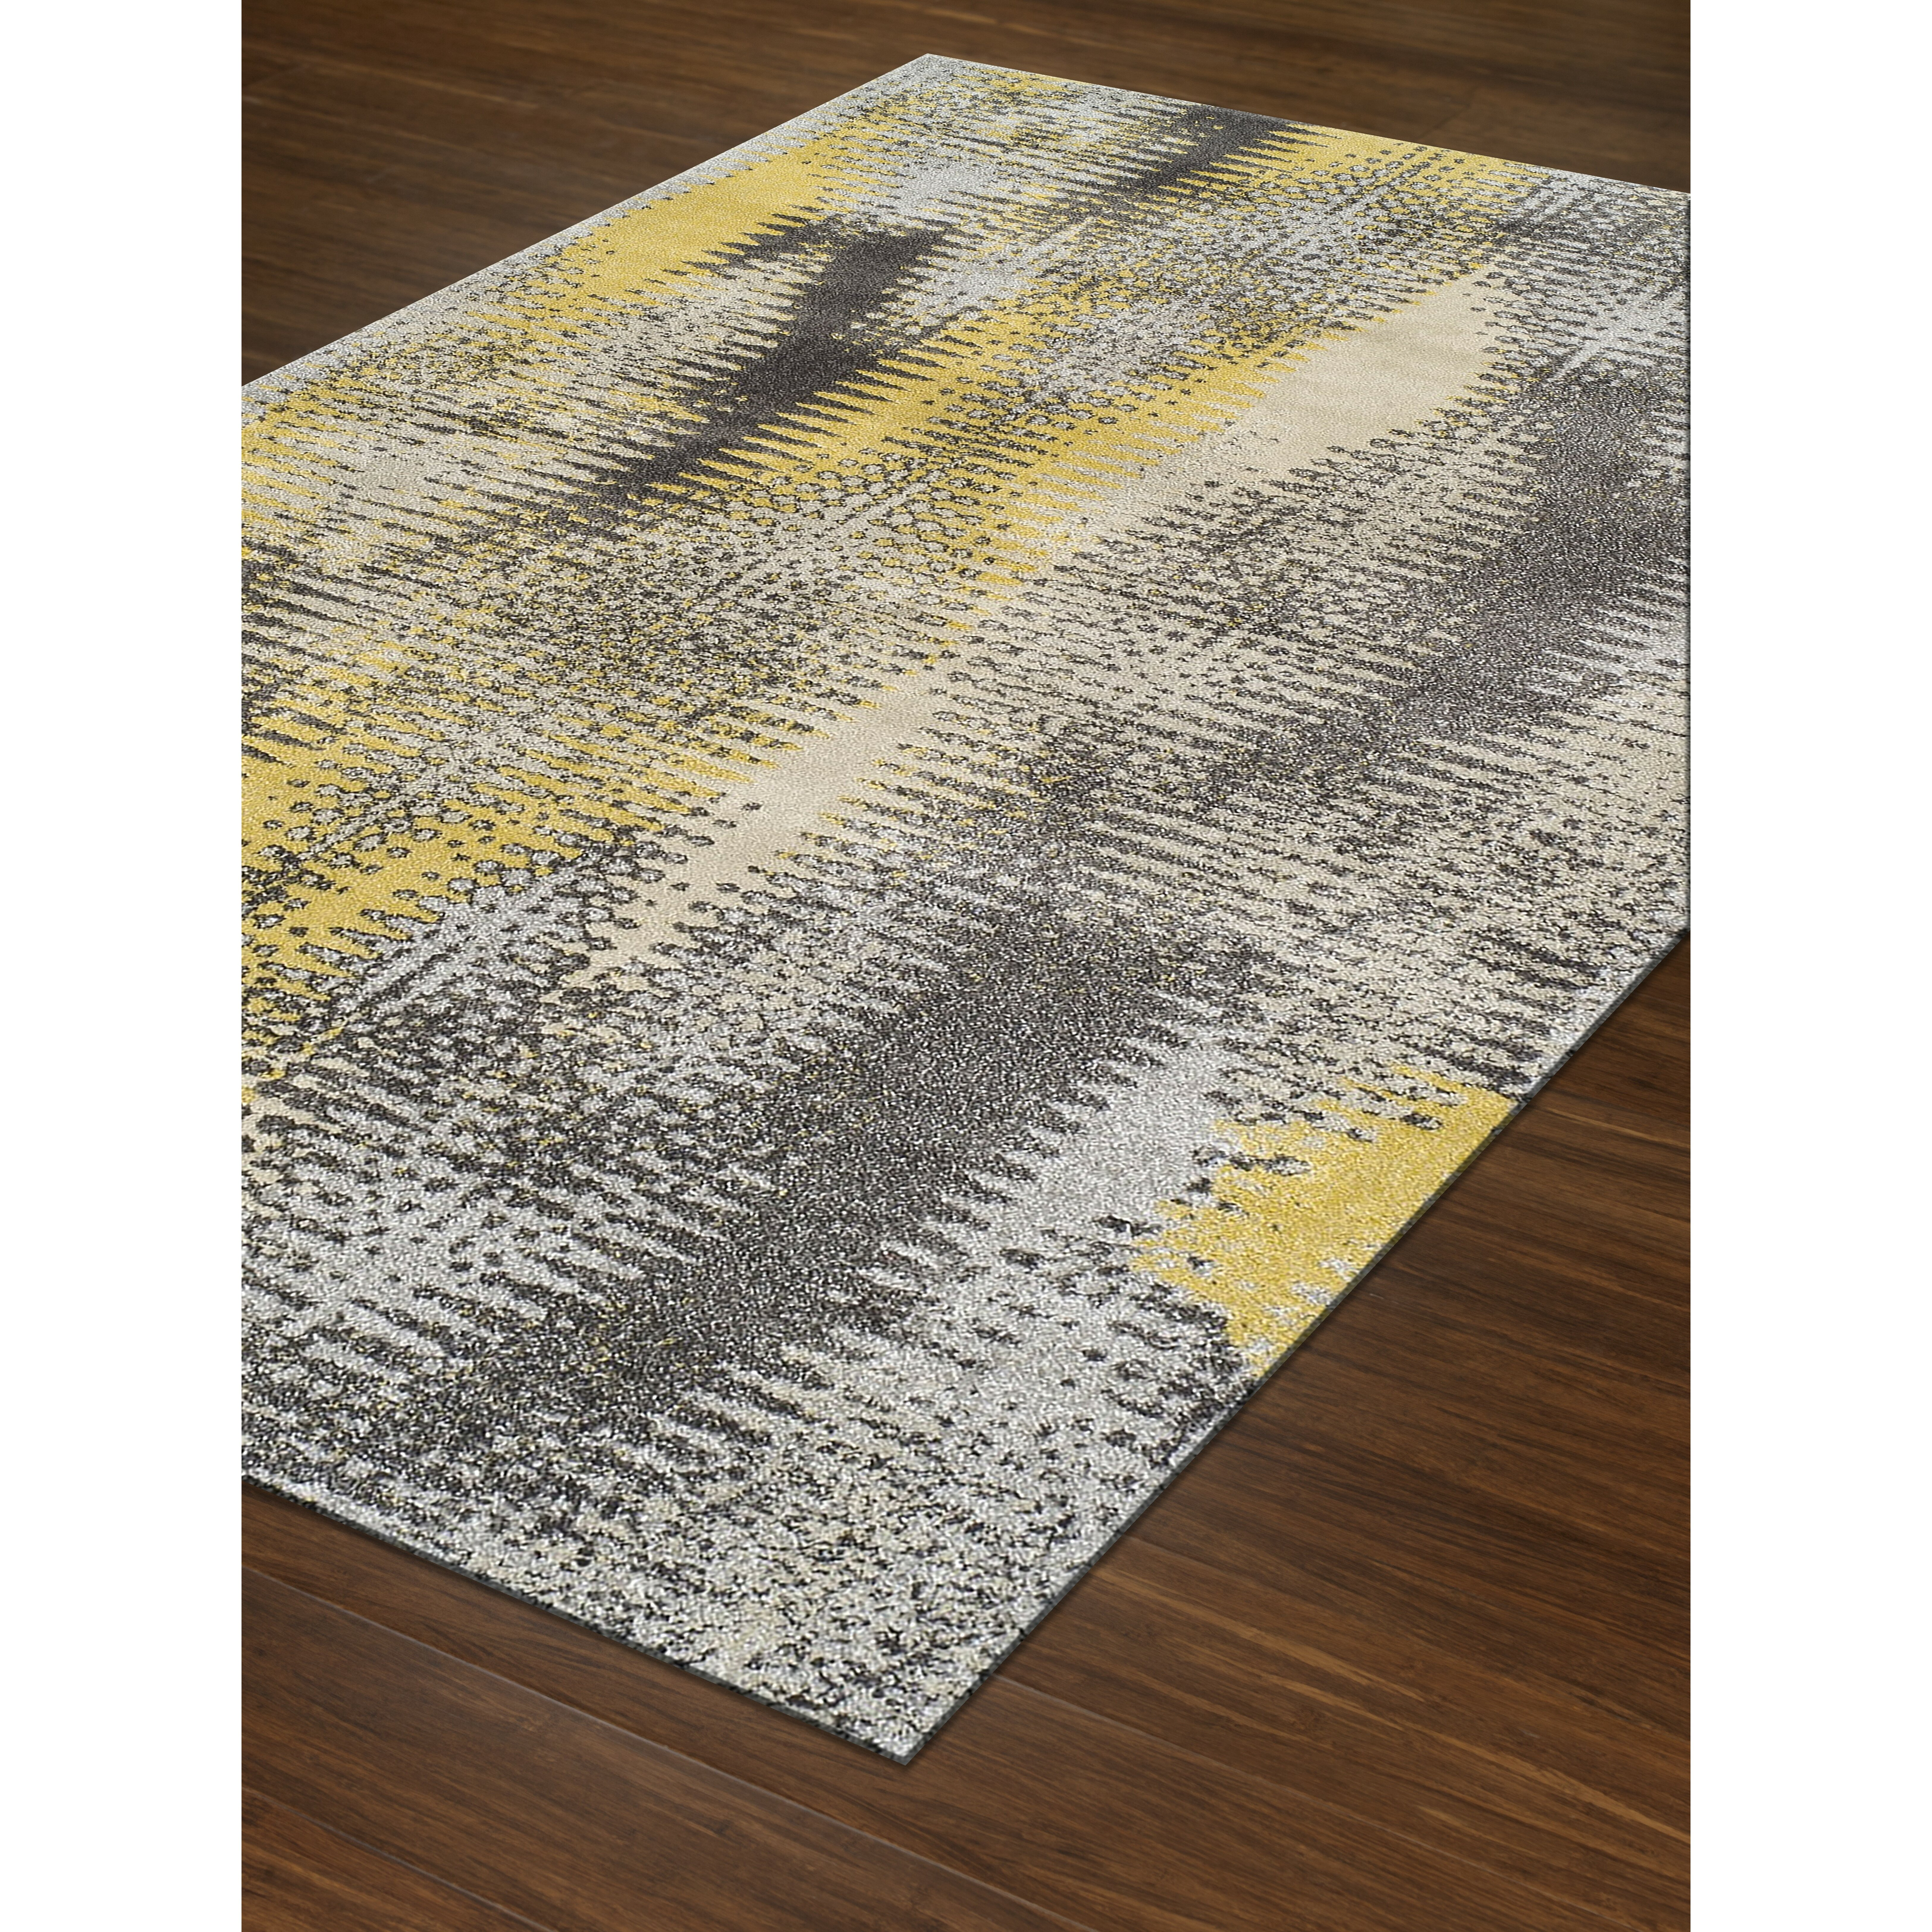 area rug companies